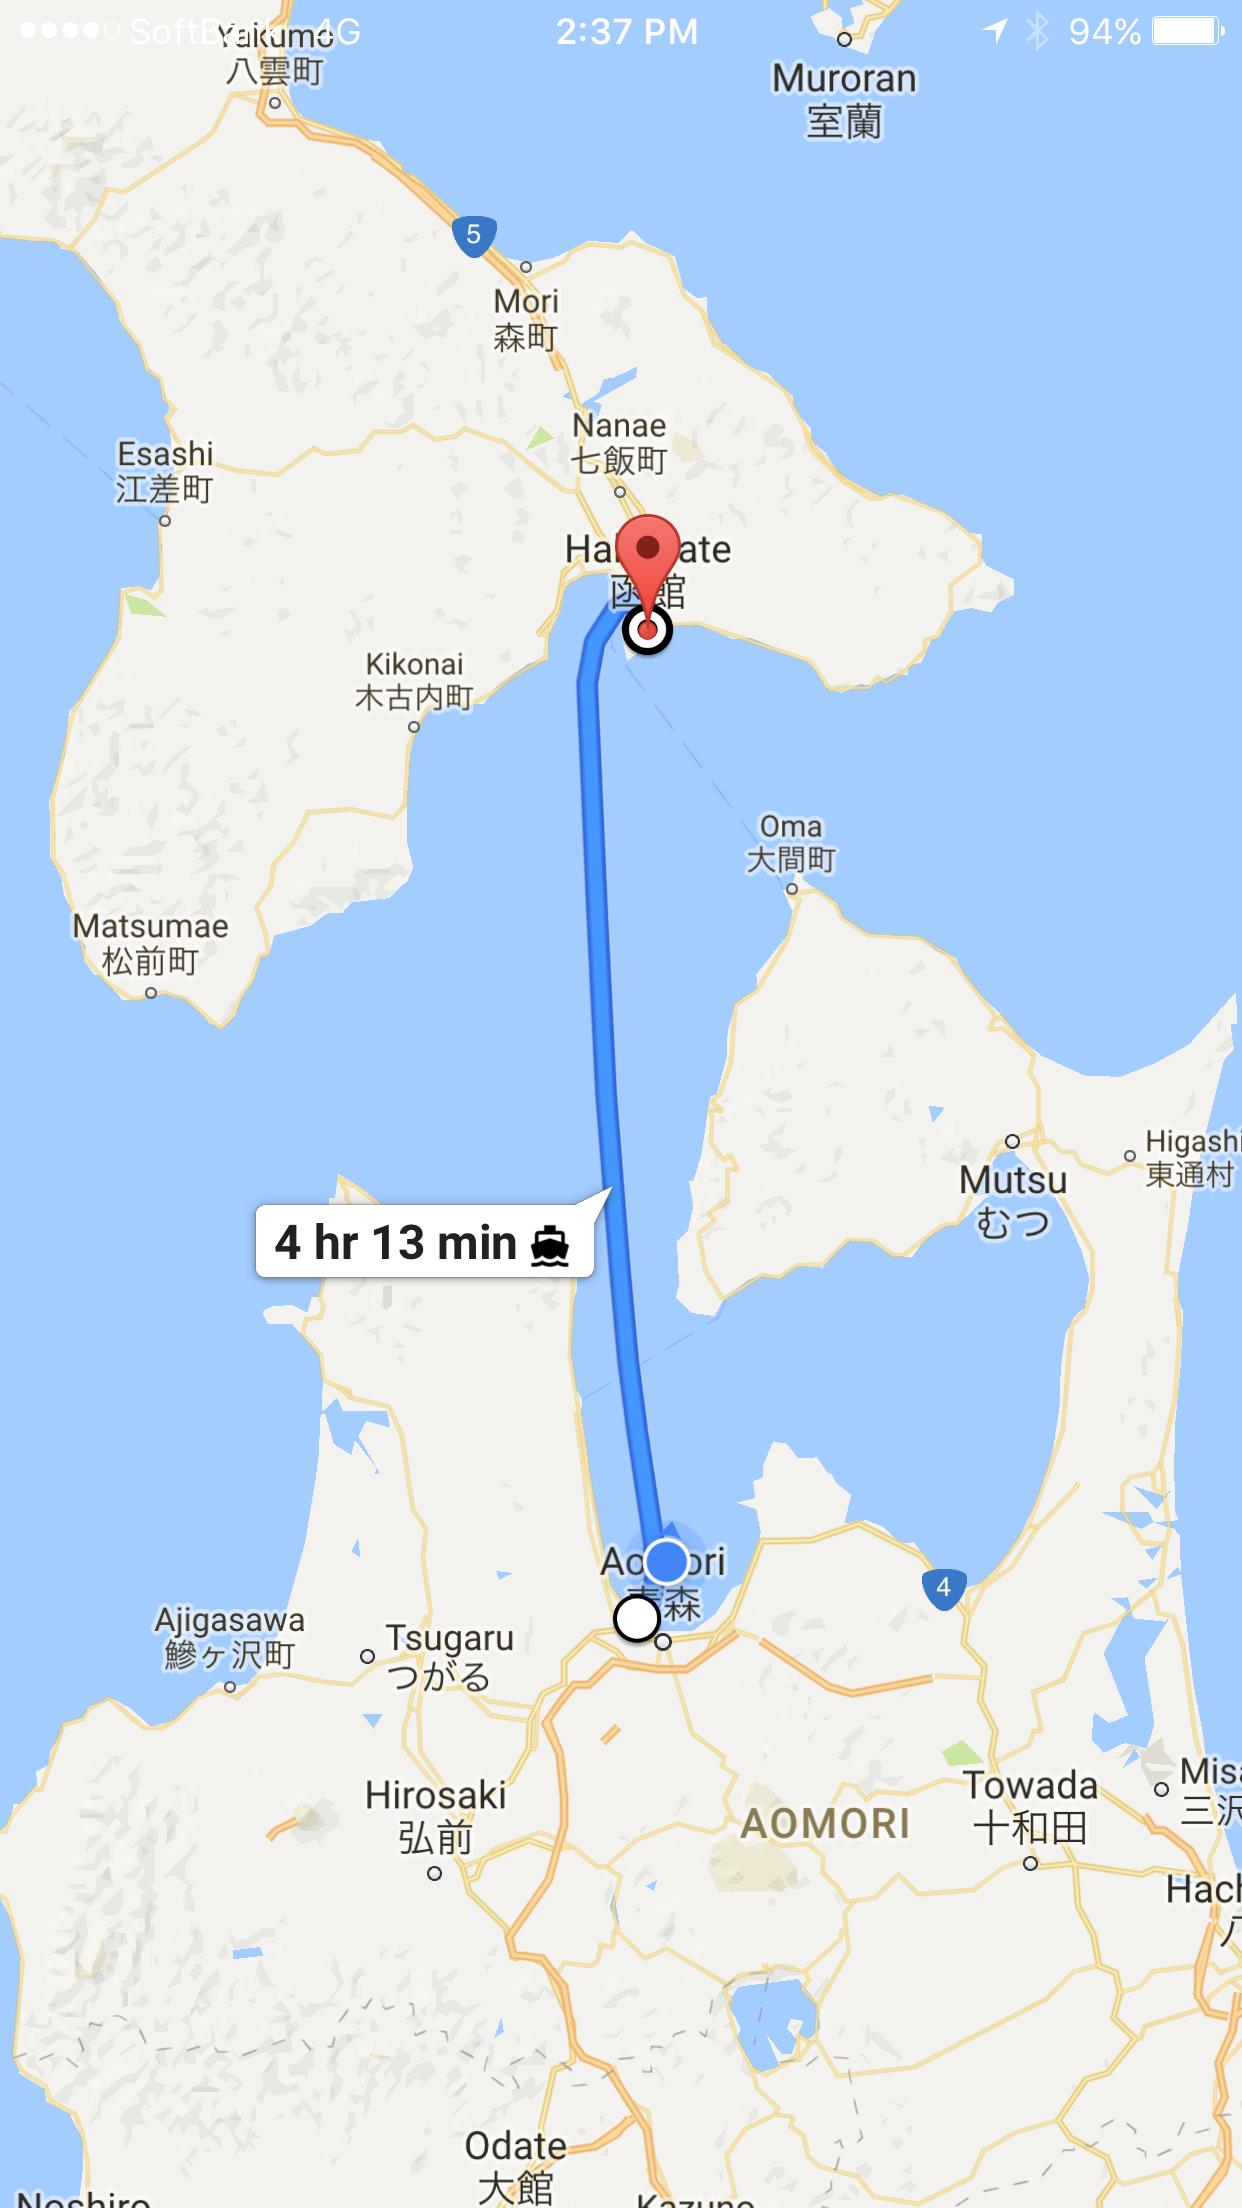 Aomori to Hakodate by ferry